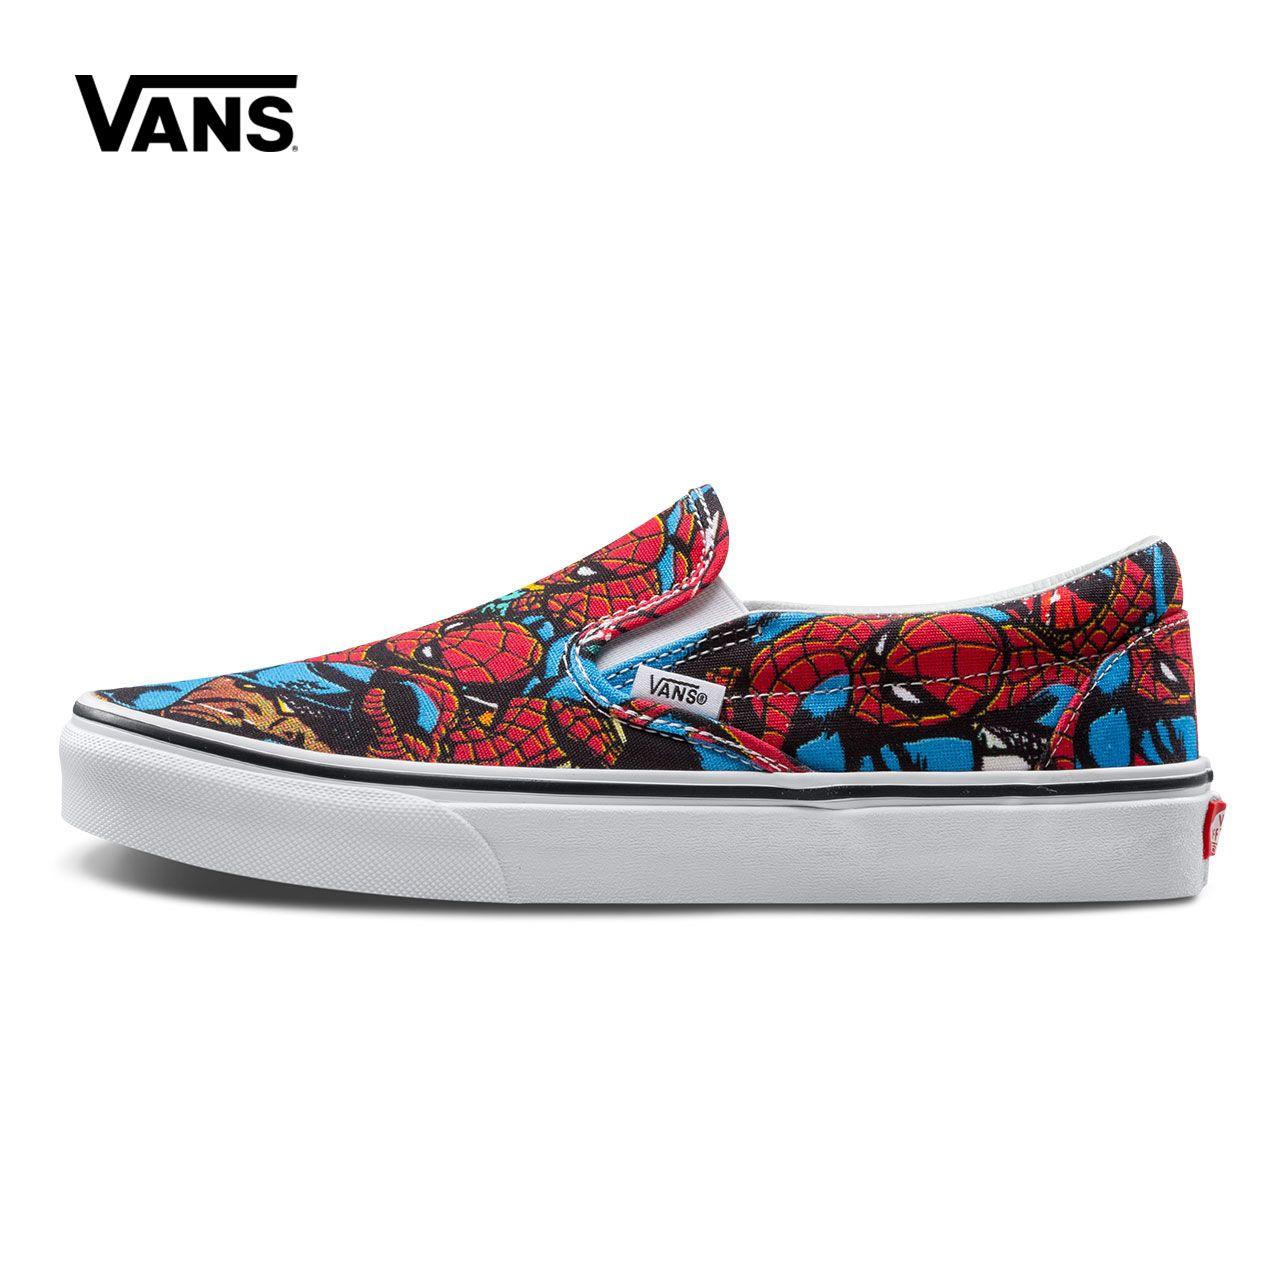 Original New Arrival Vans X Marvel Men's & Women's Classic Slip-On Low-top Skateboarding Shoes Sneakers Canvas VN0A38F79H7